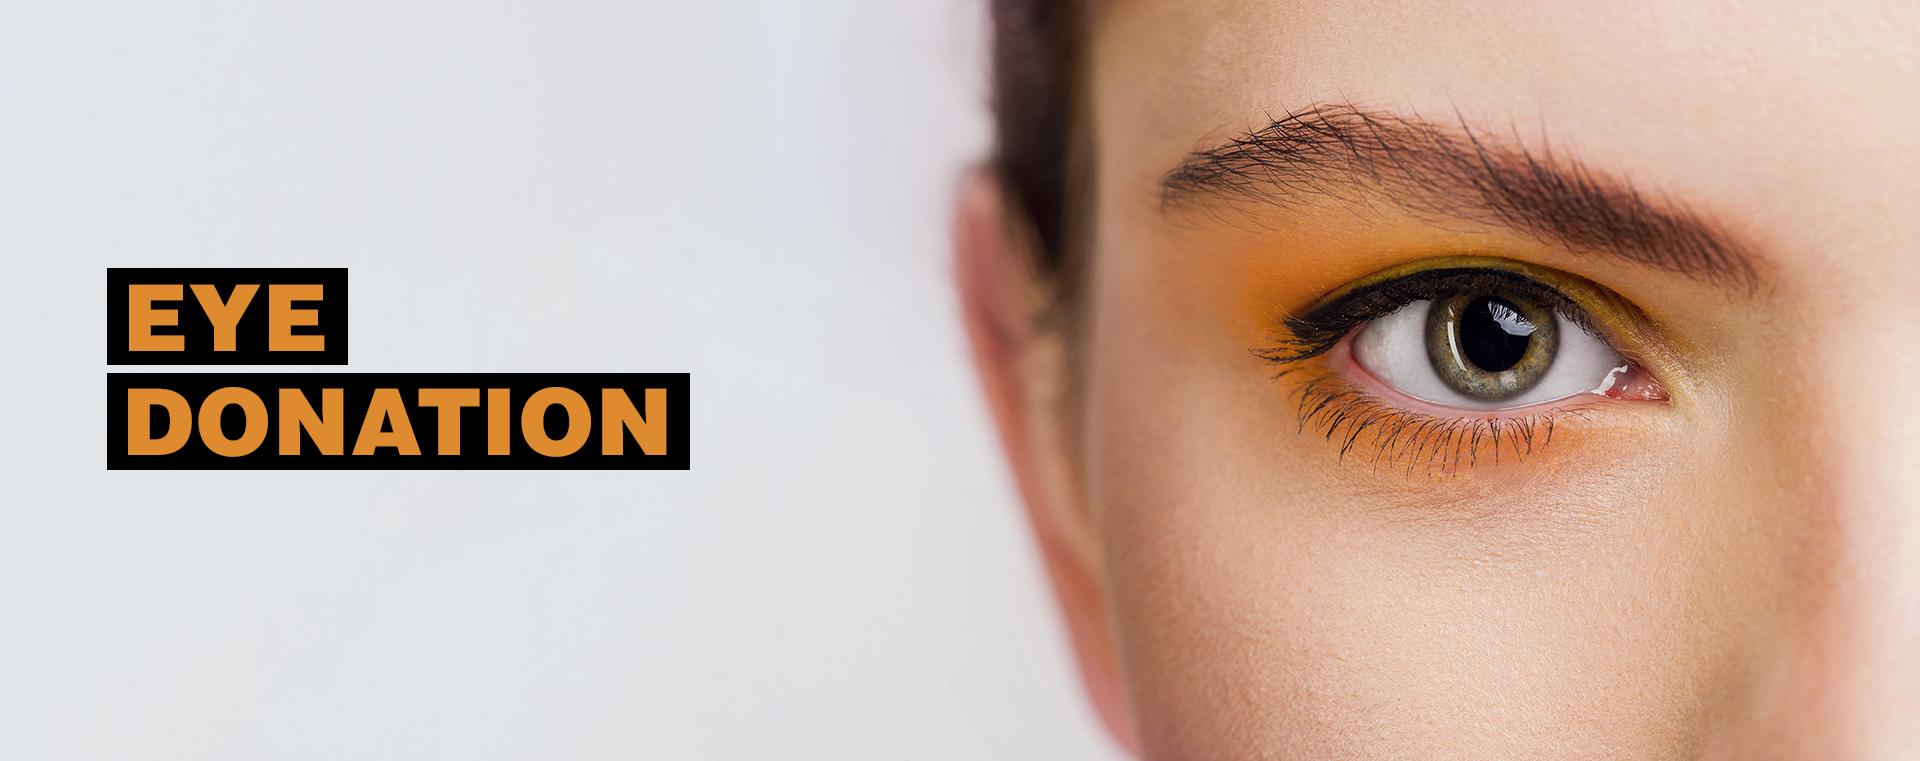 eye donation banner